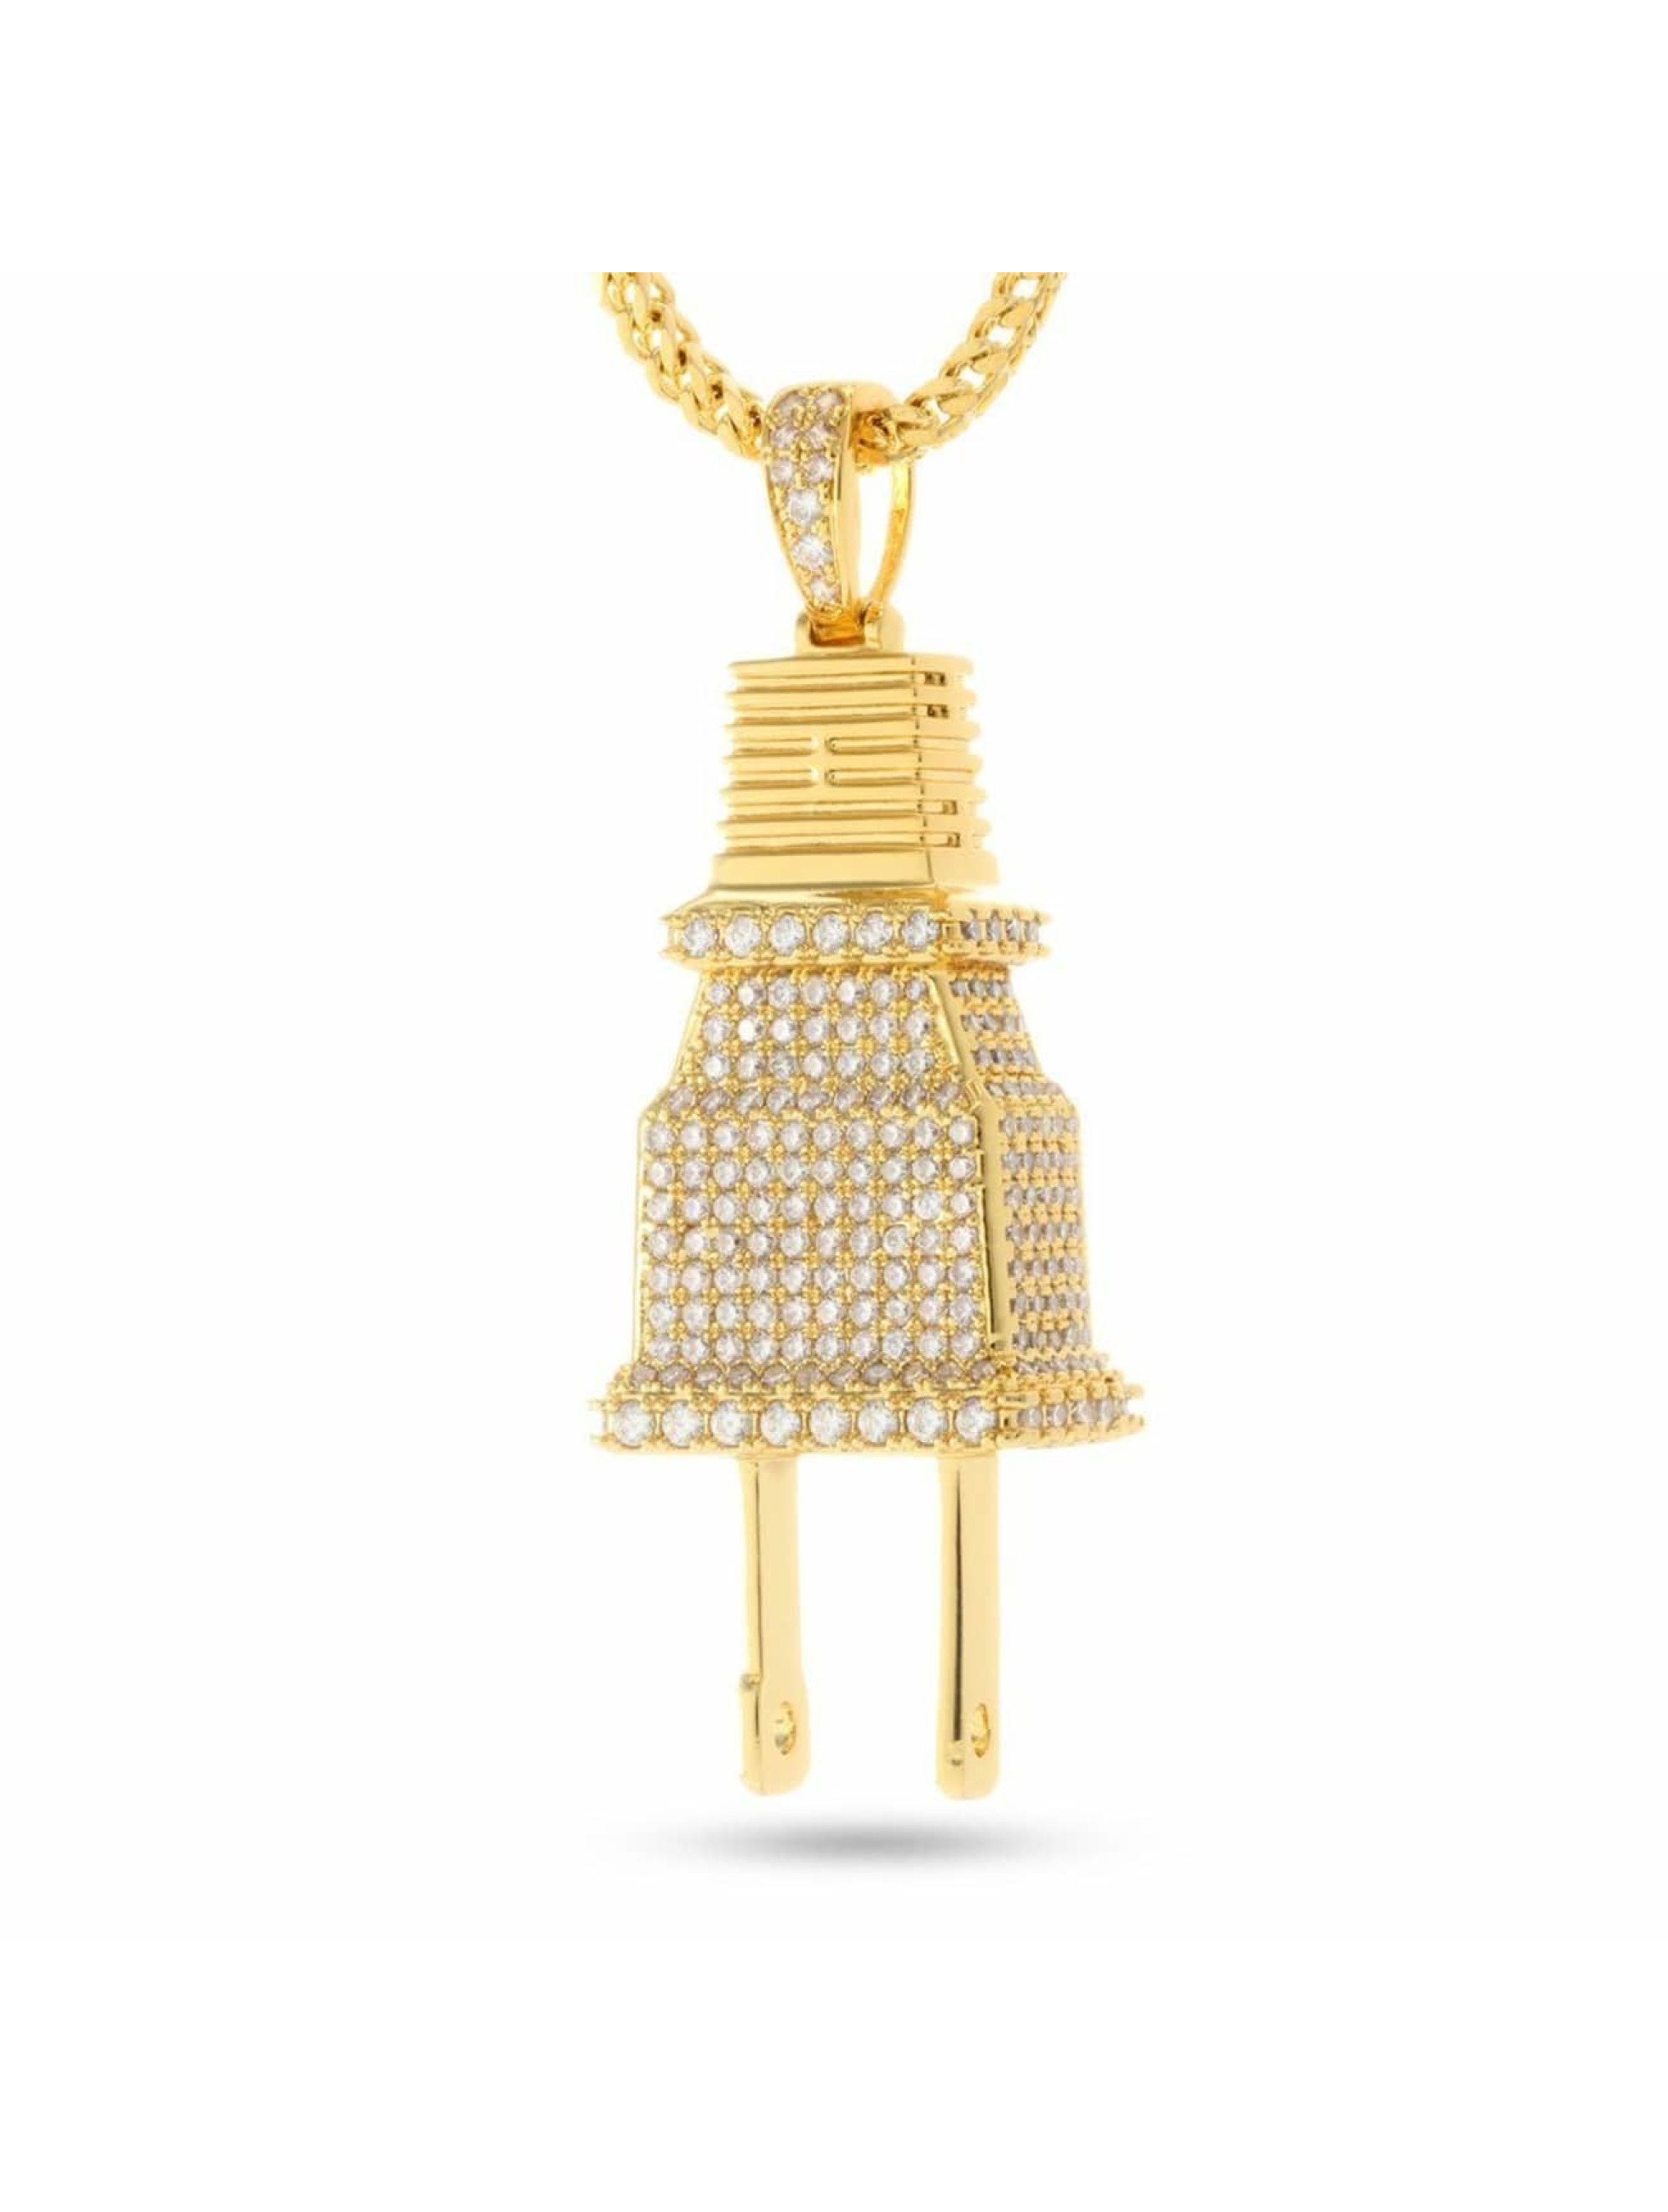 KING ICE ketting Plug goud